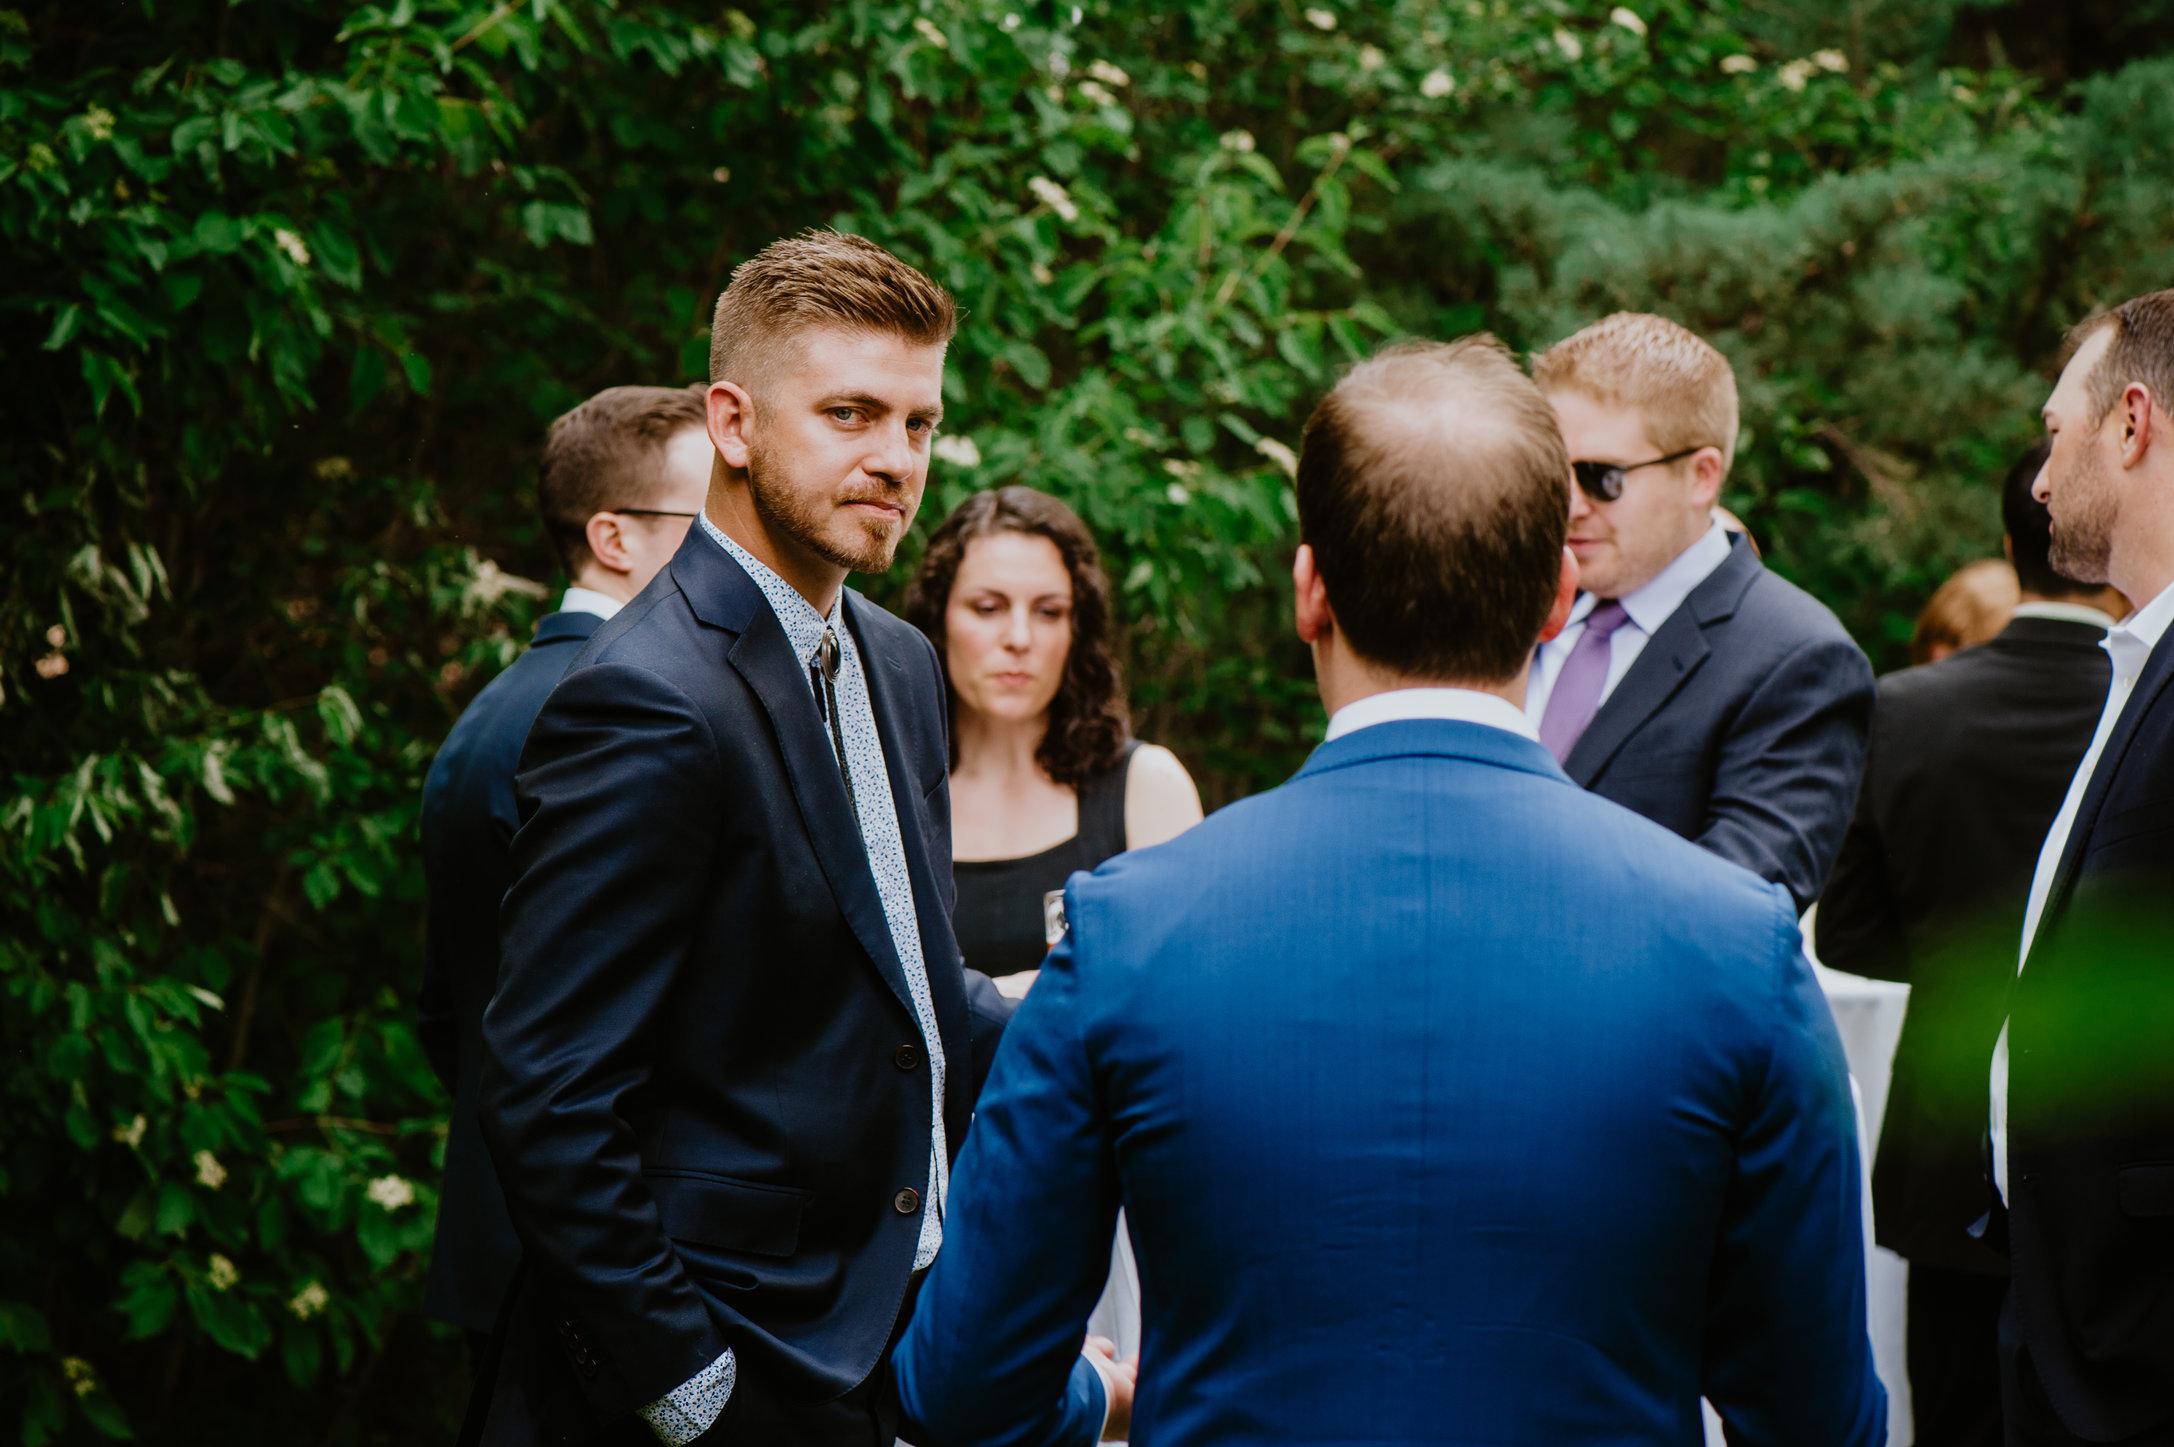 DandA-wedding-351.jpg